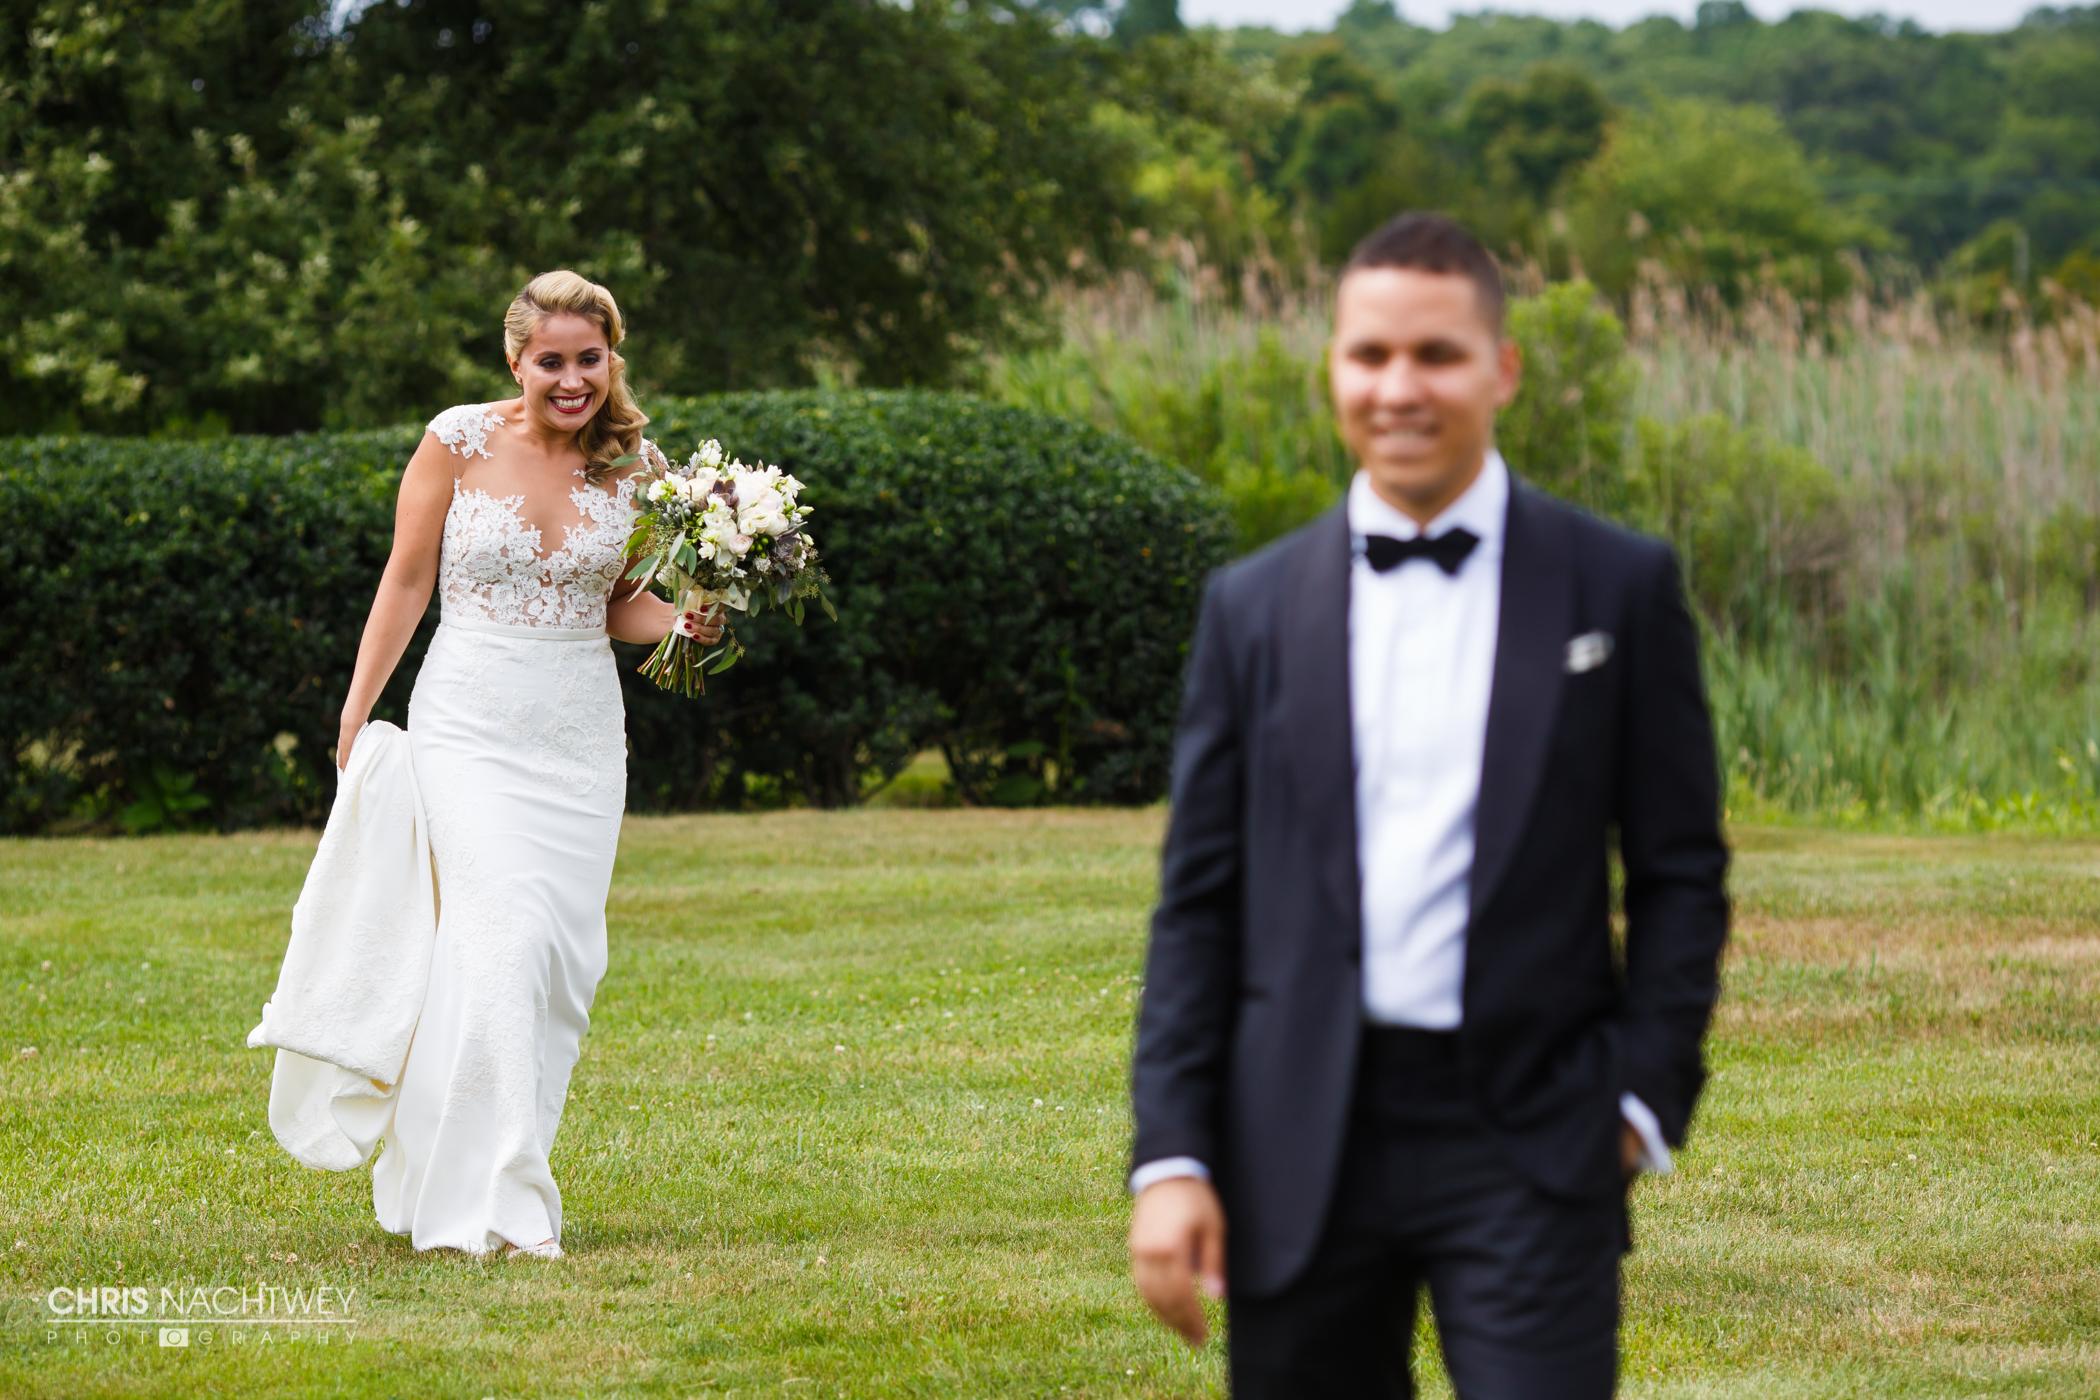 wedding-saltwater-farm-vineyard-photos-stonington-ct-chris-nachtwey-photography-2016-ana-austin-13.jpg